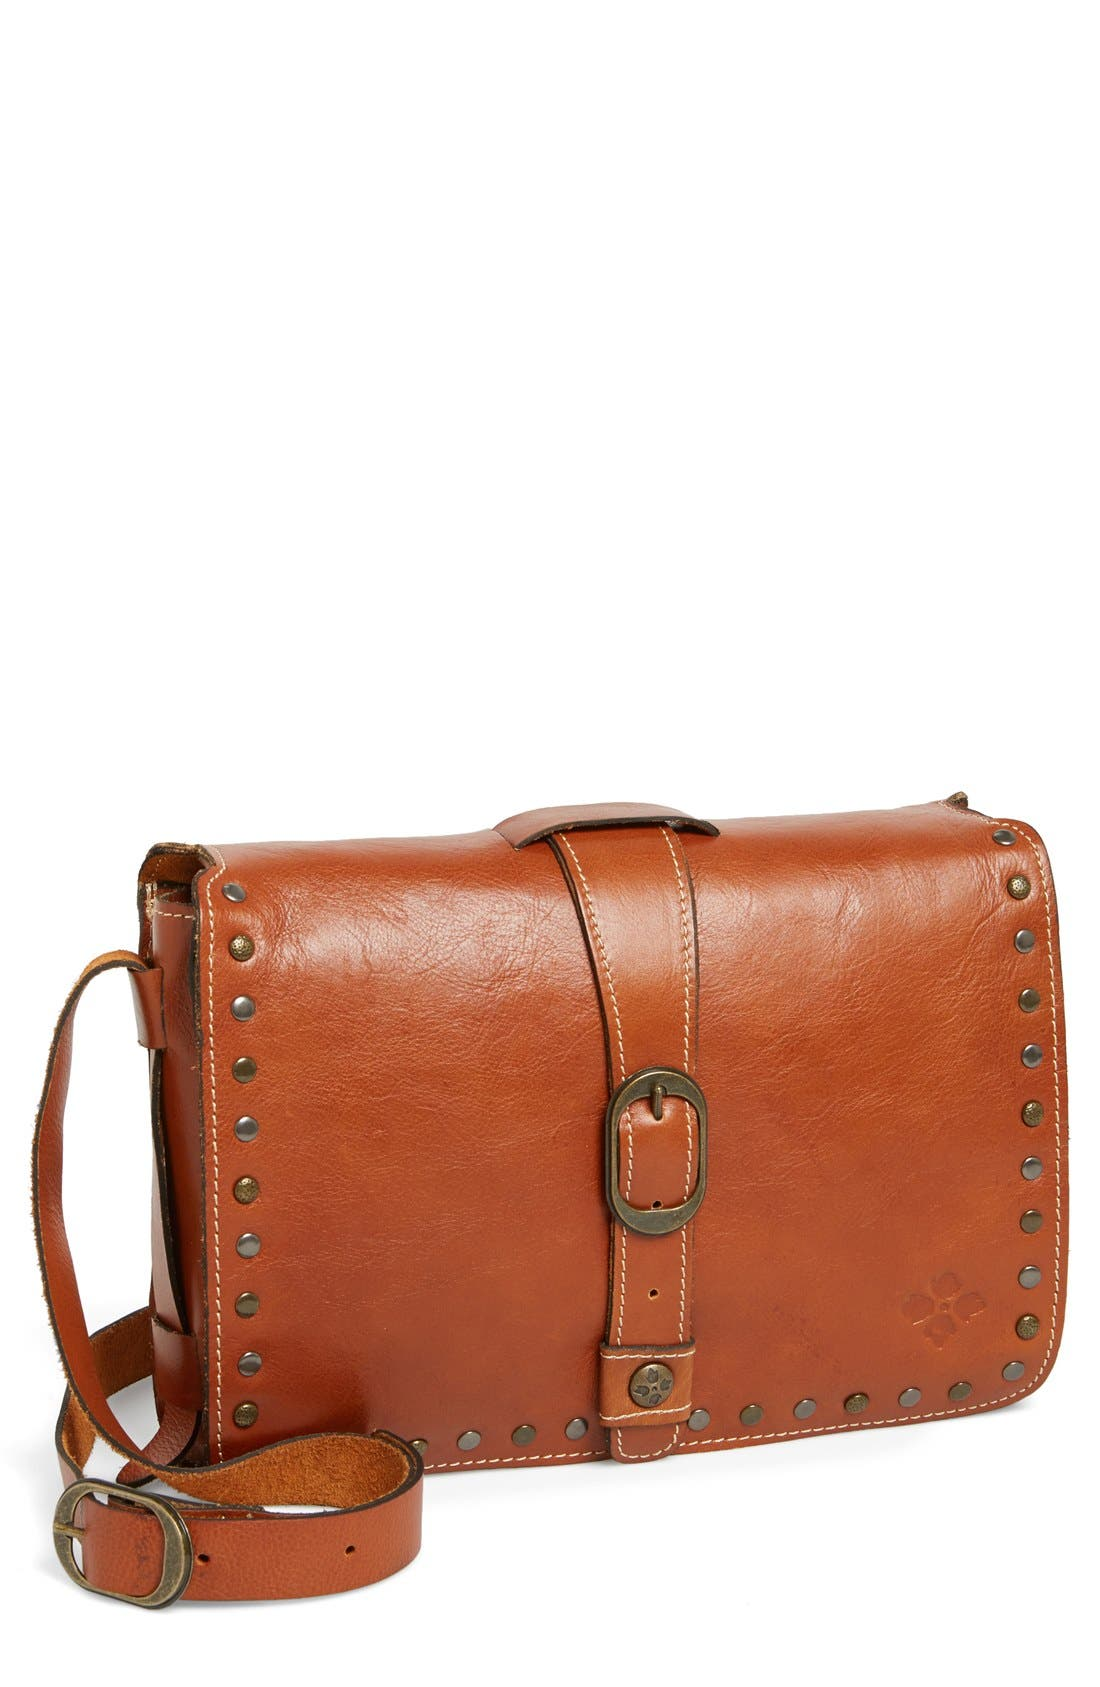 Alternate Image 1 Selected - Patricia Nash 'Mantova' Leather Crossbody Bag